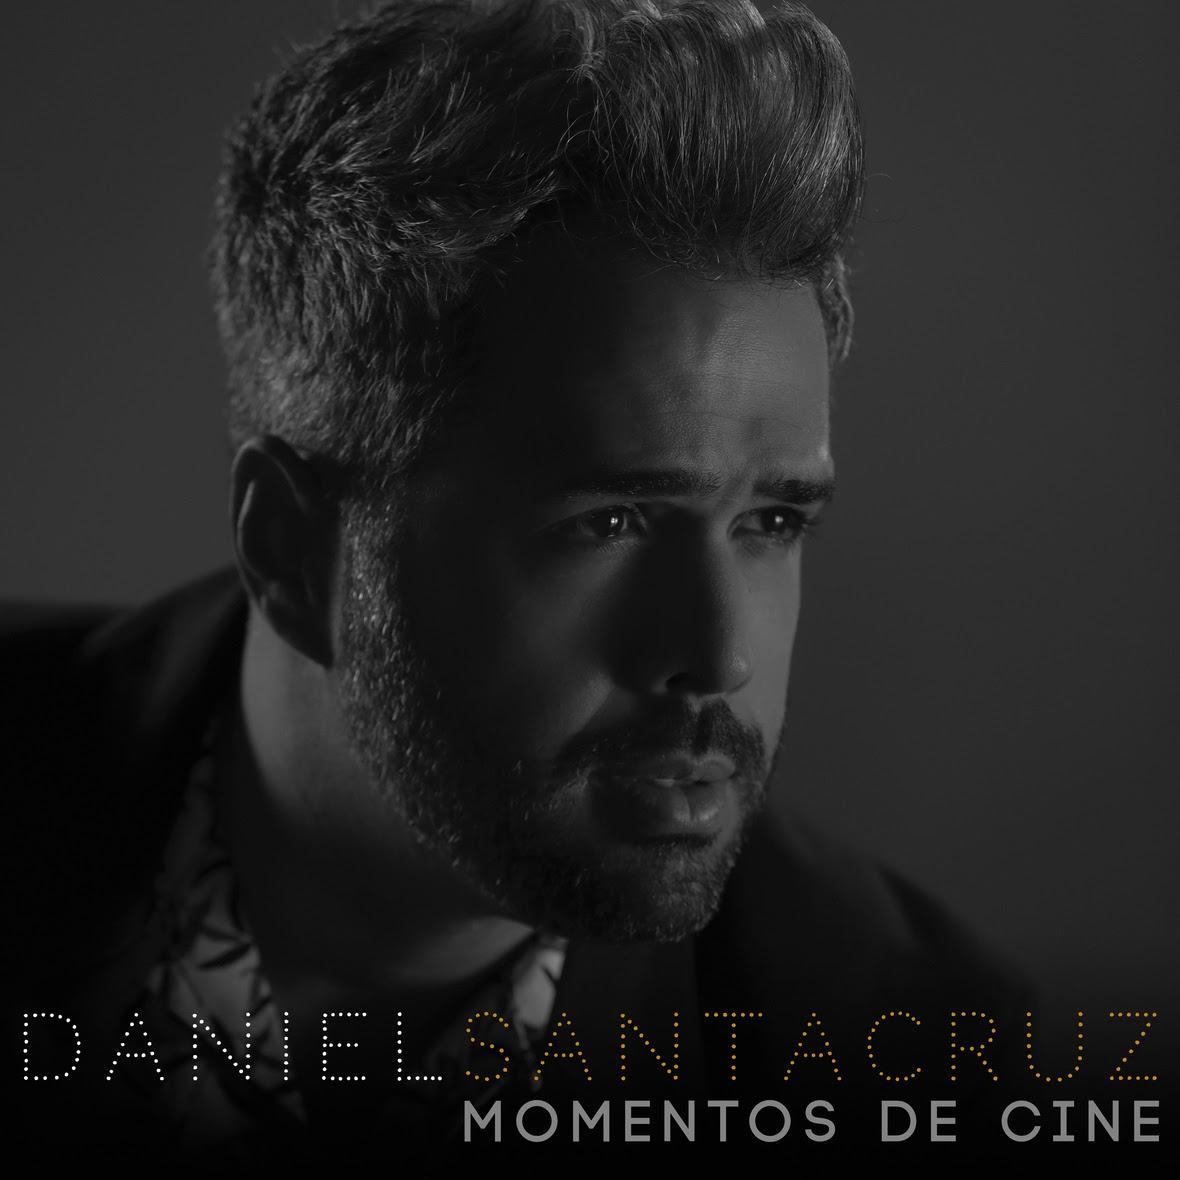 MOMENTOS DE CINE CARATULA 2